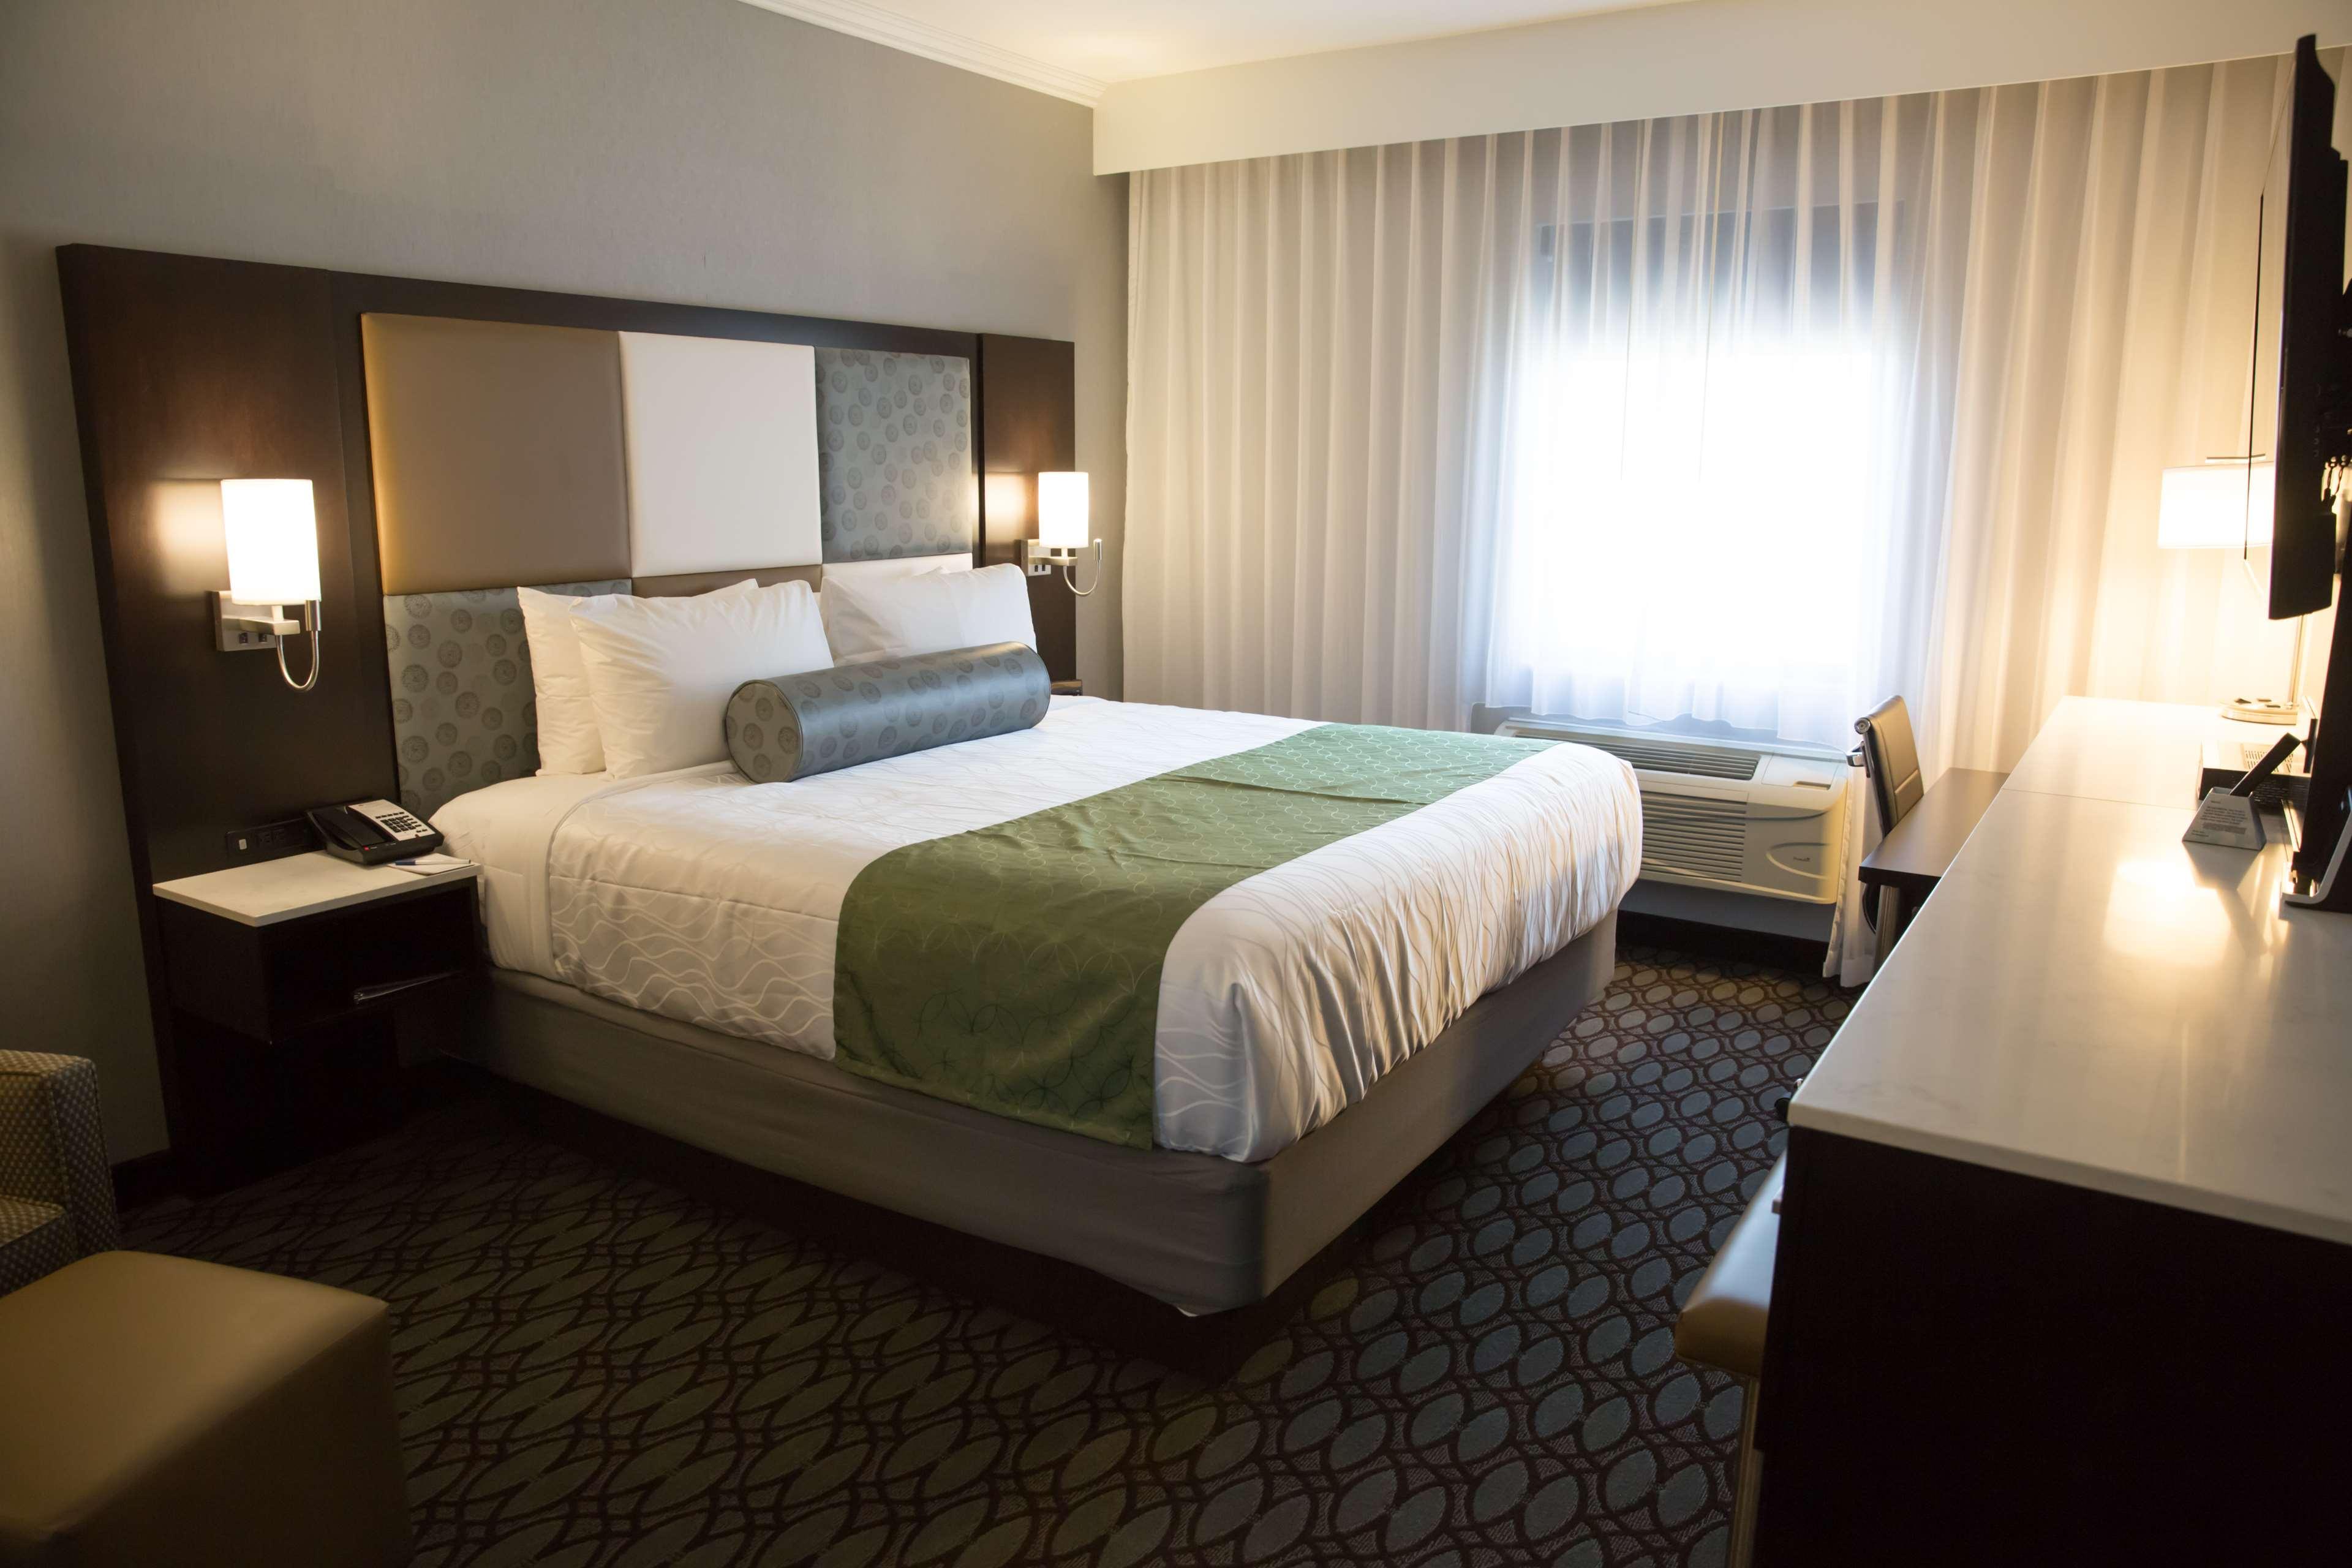 Best Western Premier NYC Gateway Hotel image 23